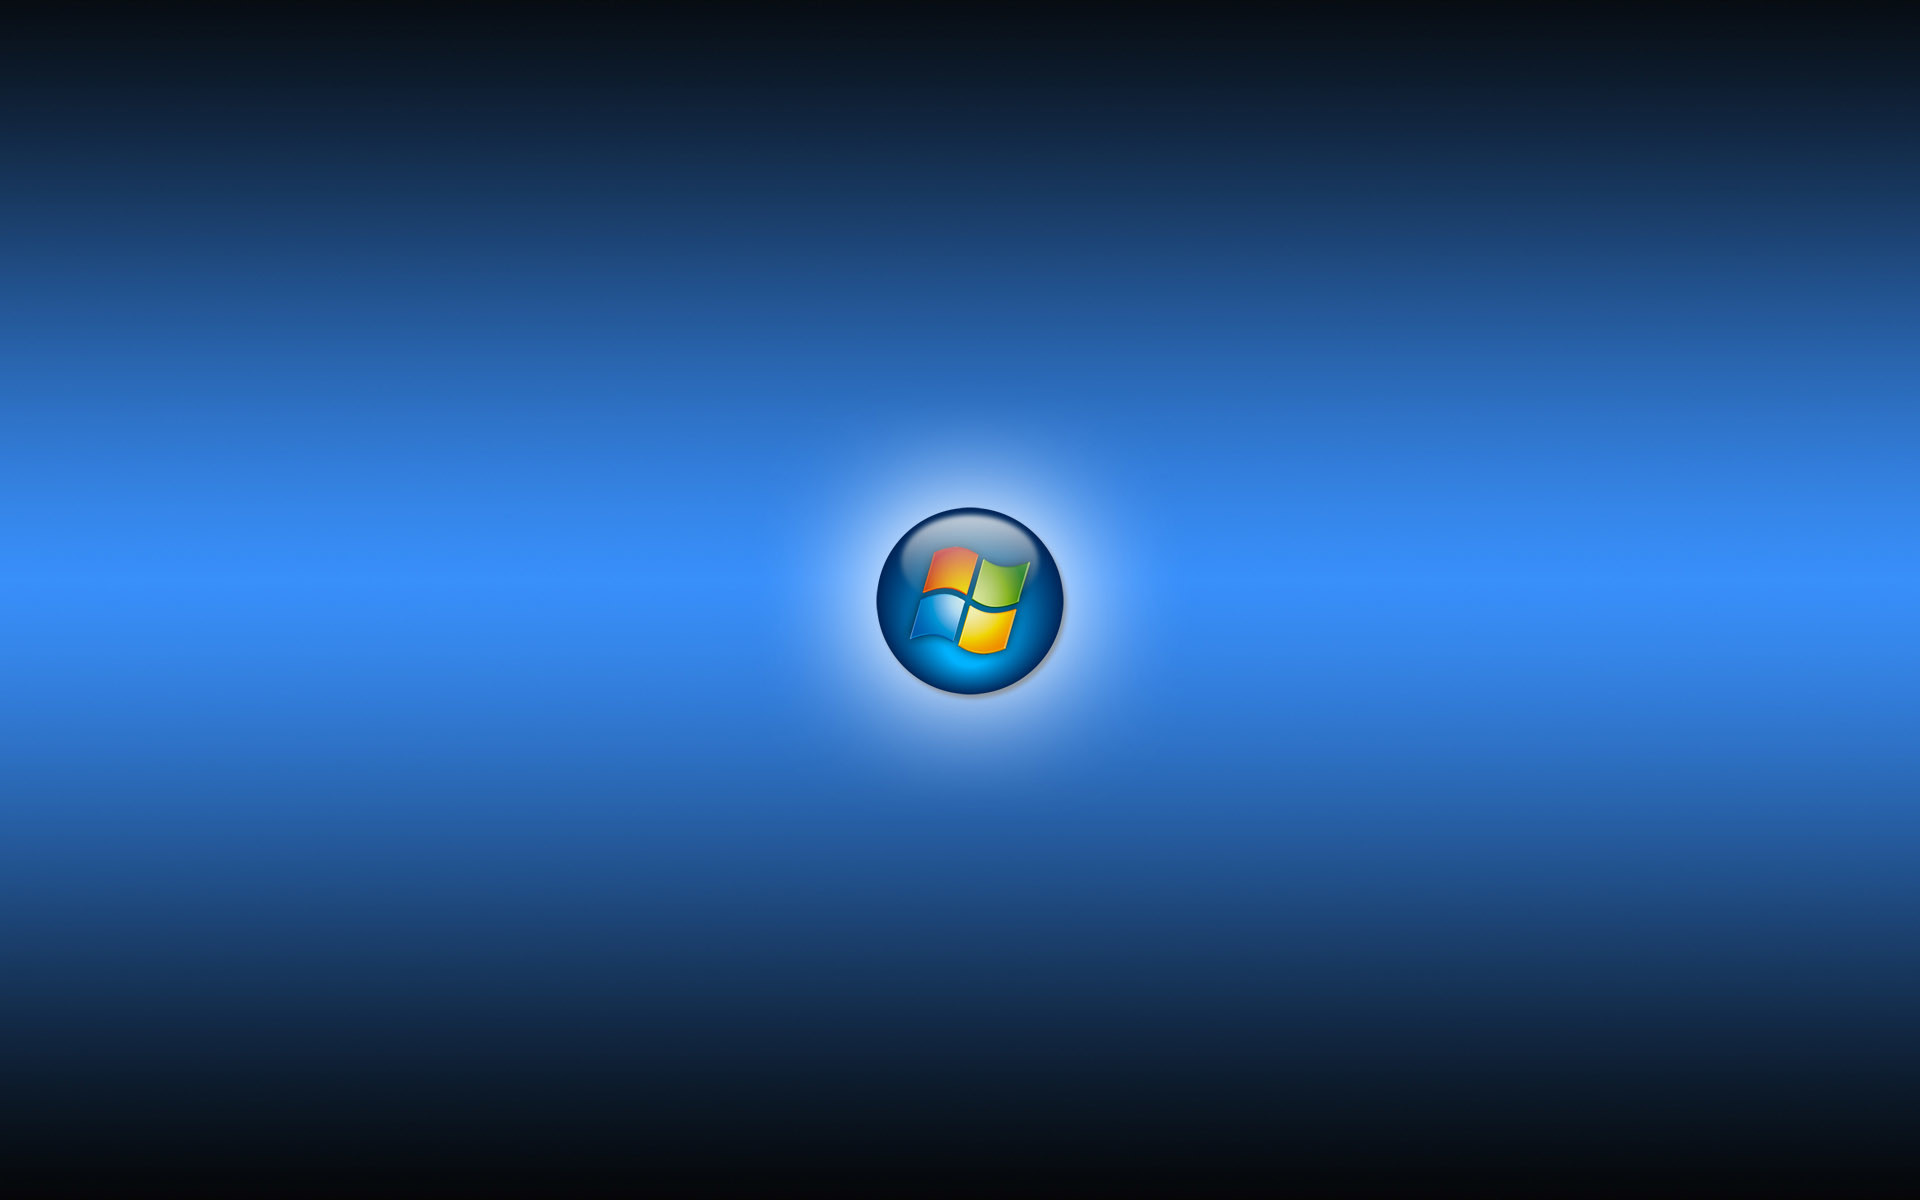 Res: 1920x1200, desktop, blue, logo, vista, wallpaper, windows, computer